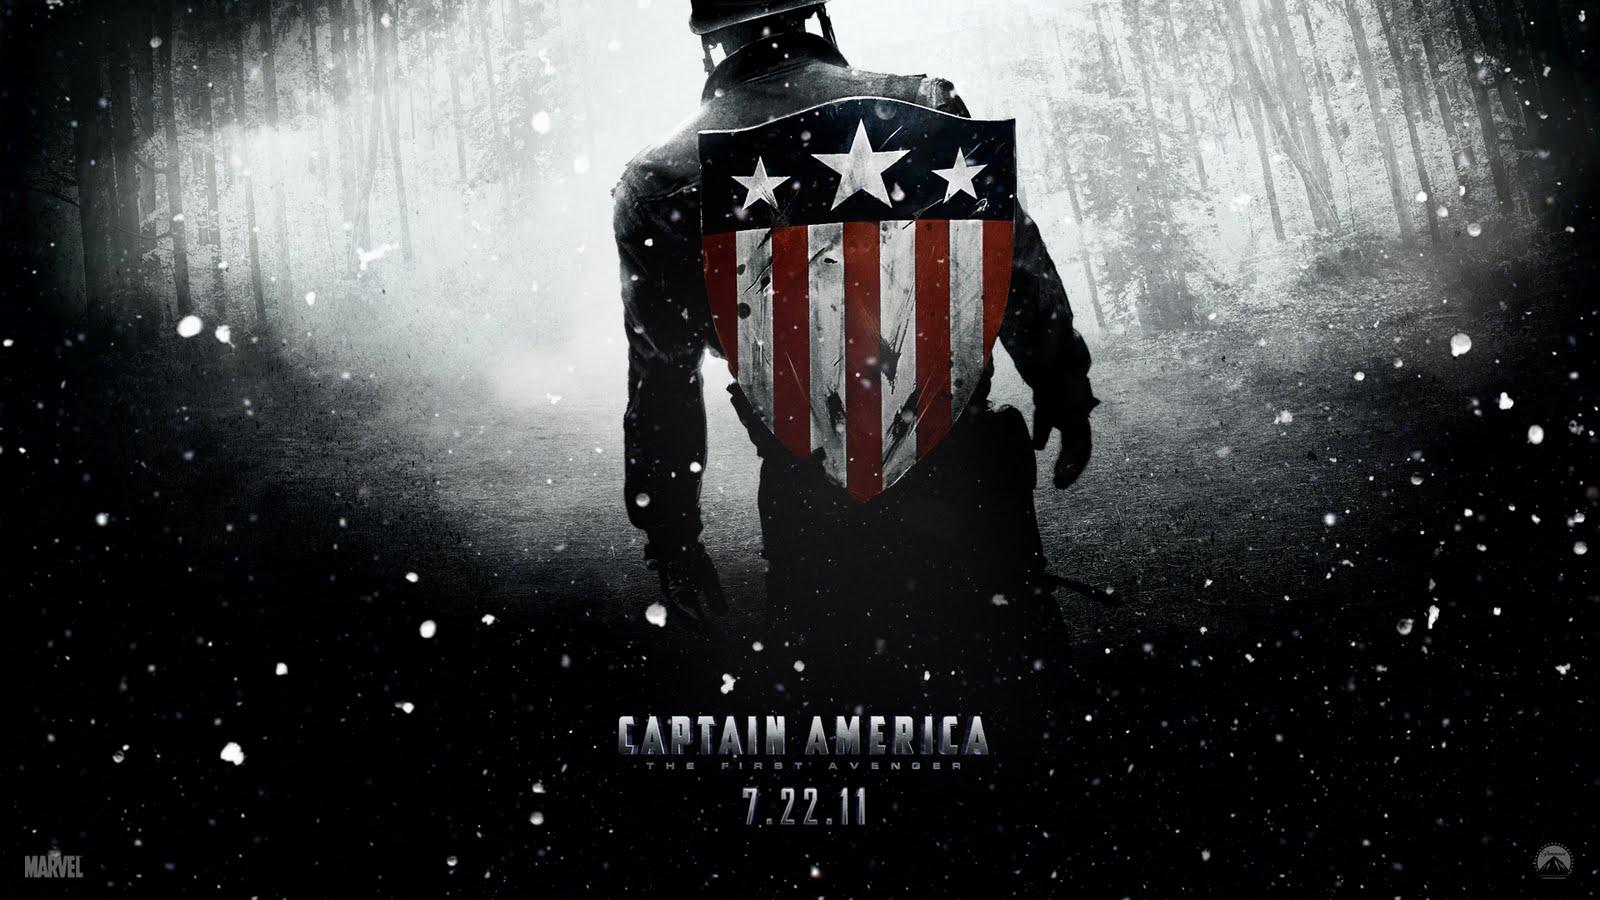 Wallpaper Coolest Captain America The First Avenger Movie